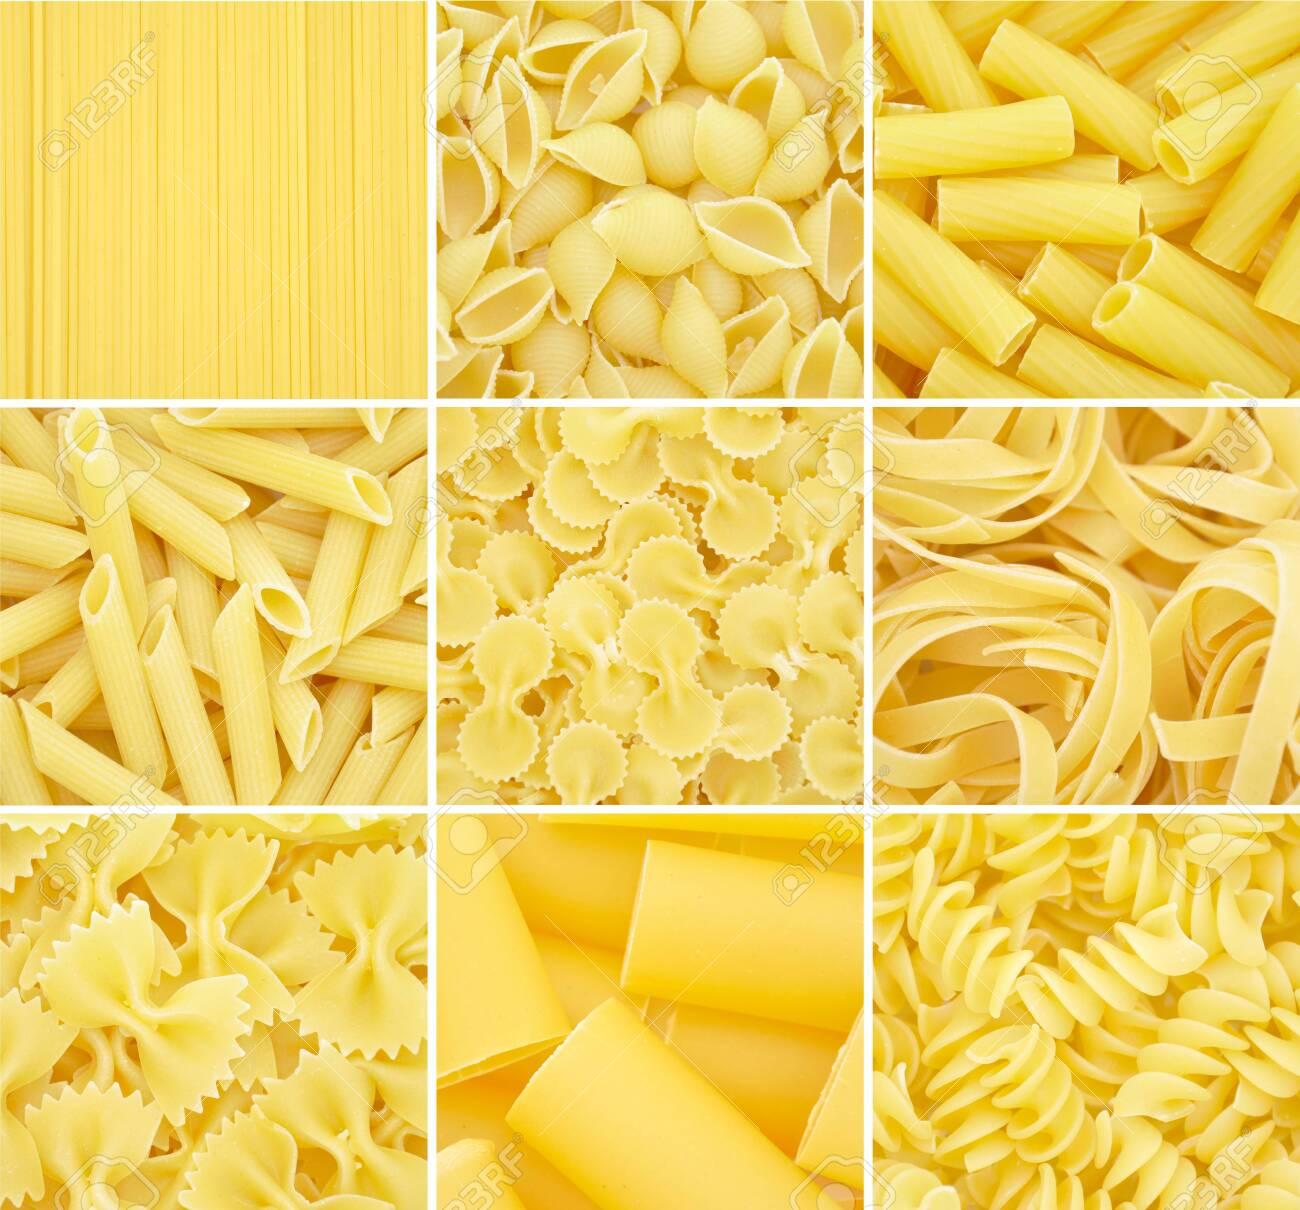 Pasta. Raw italian food isolated on white background - 150233094